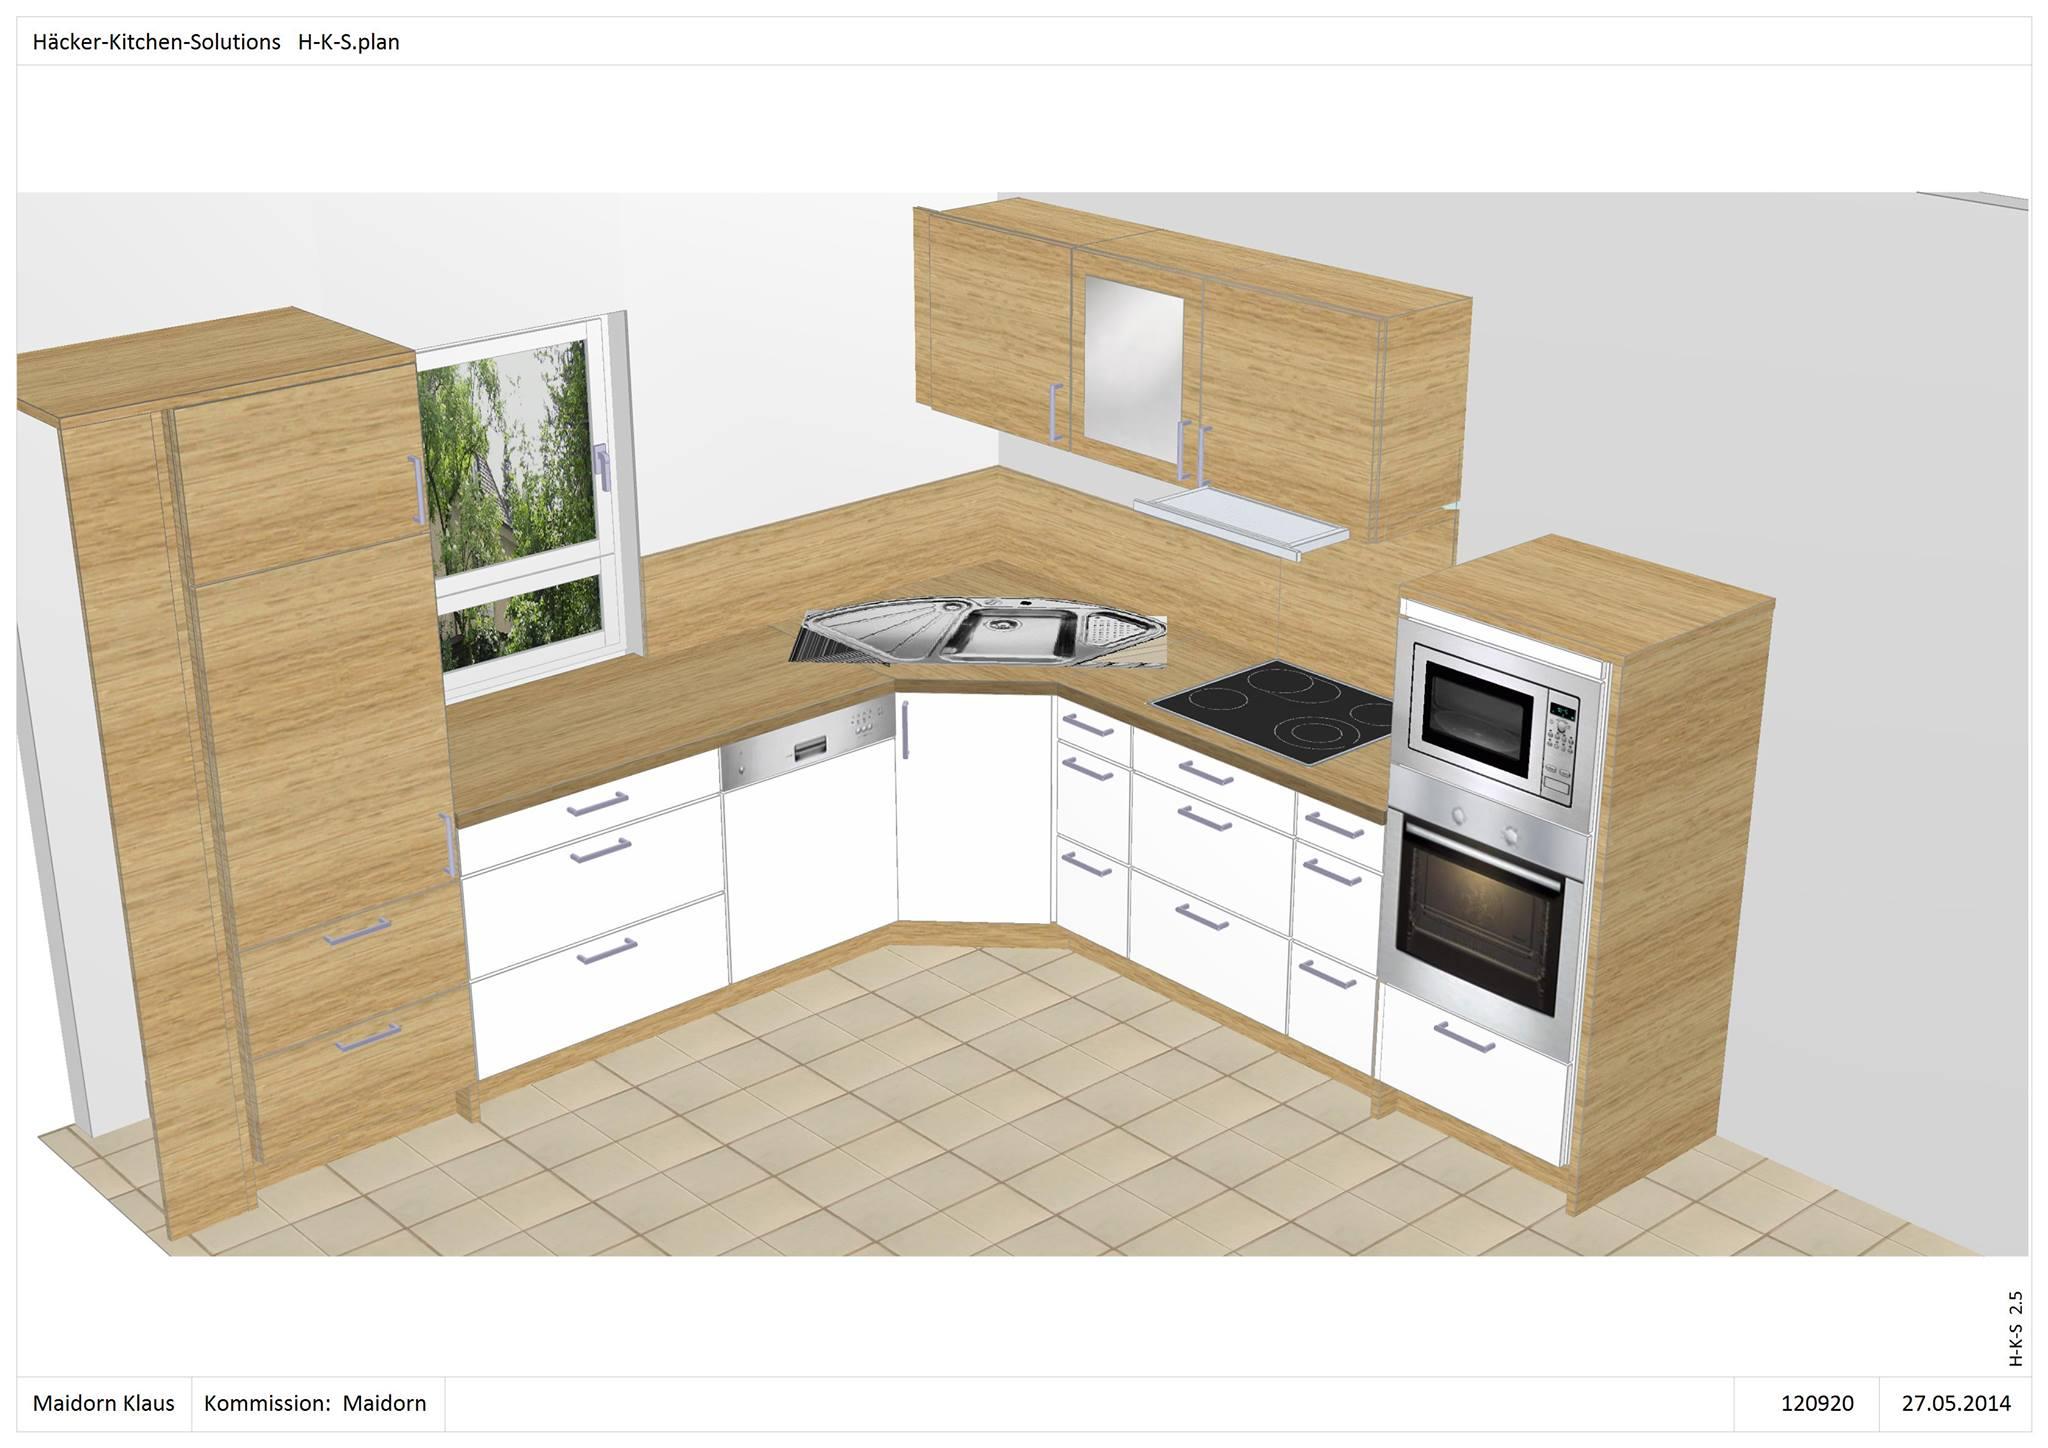 Küchenstudio Plan | arkhia.com | {Küchenstudio plan 0}